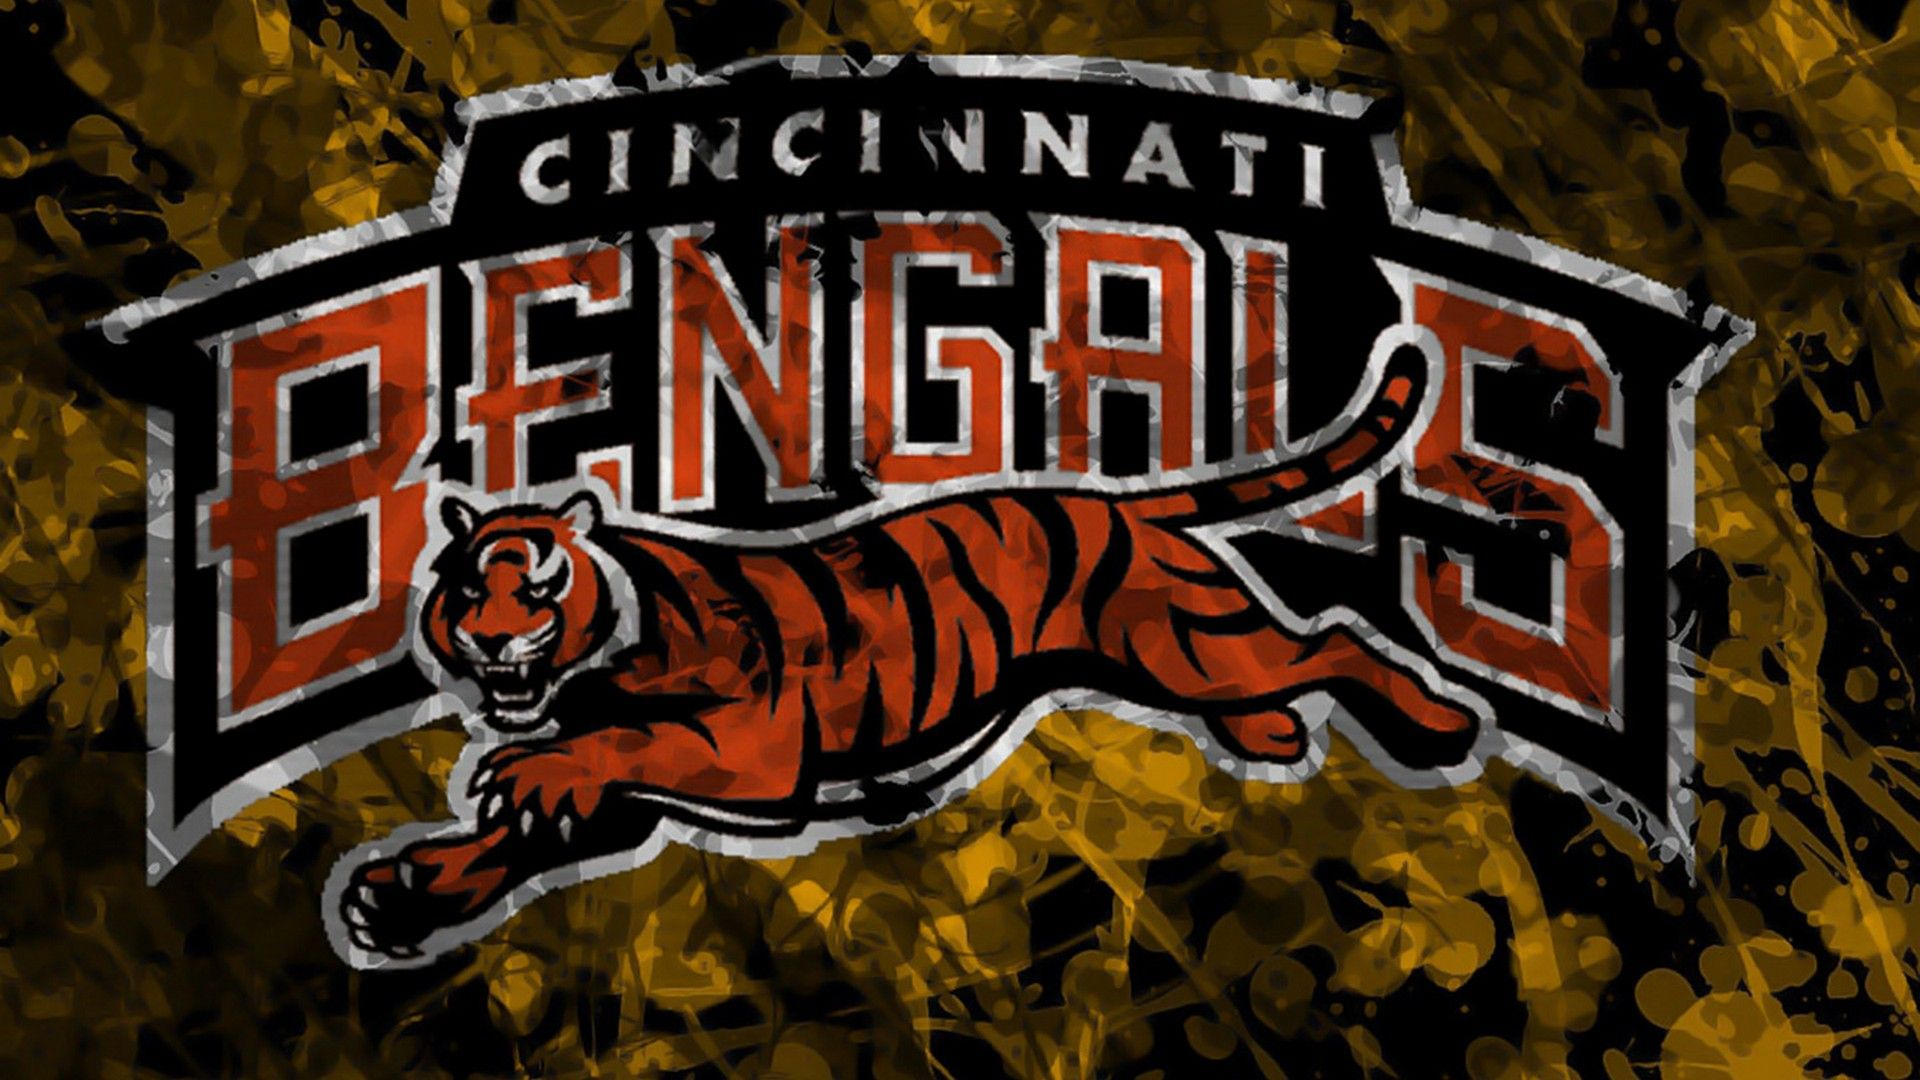 Wallpapers Hd Cincinnati Bengals 2021 Nfl Football Wallpapers Cincinnati Bengals Bengals Wallpaper Cincinnati Bengals Wallpapers